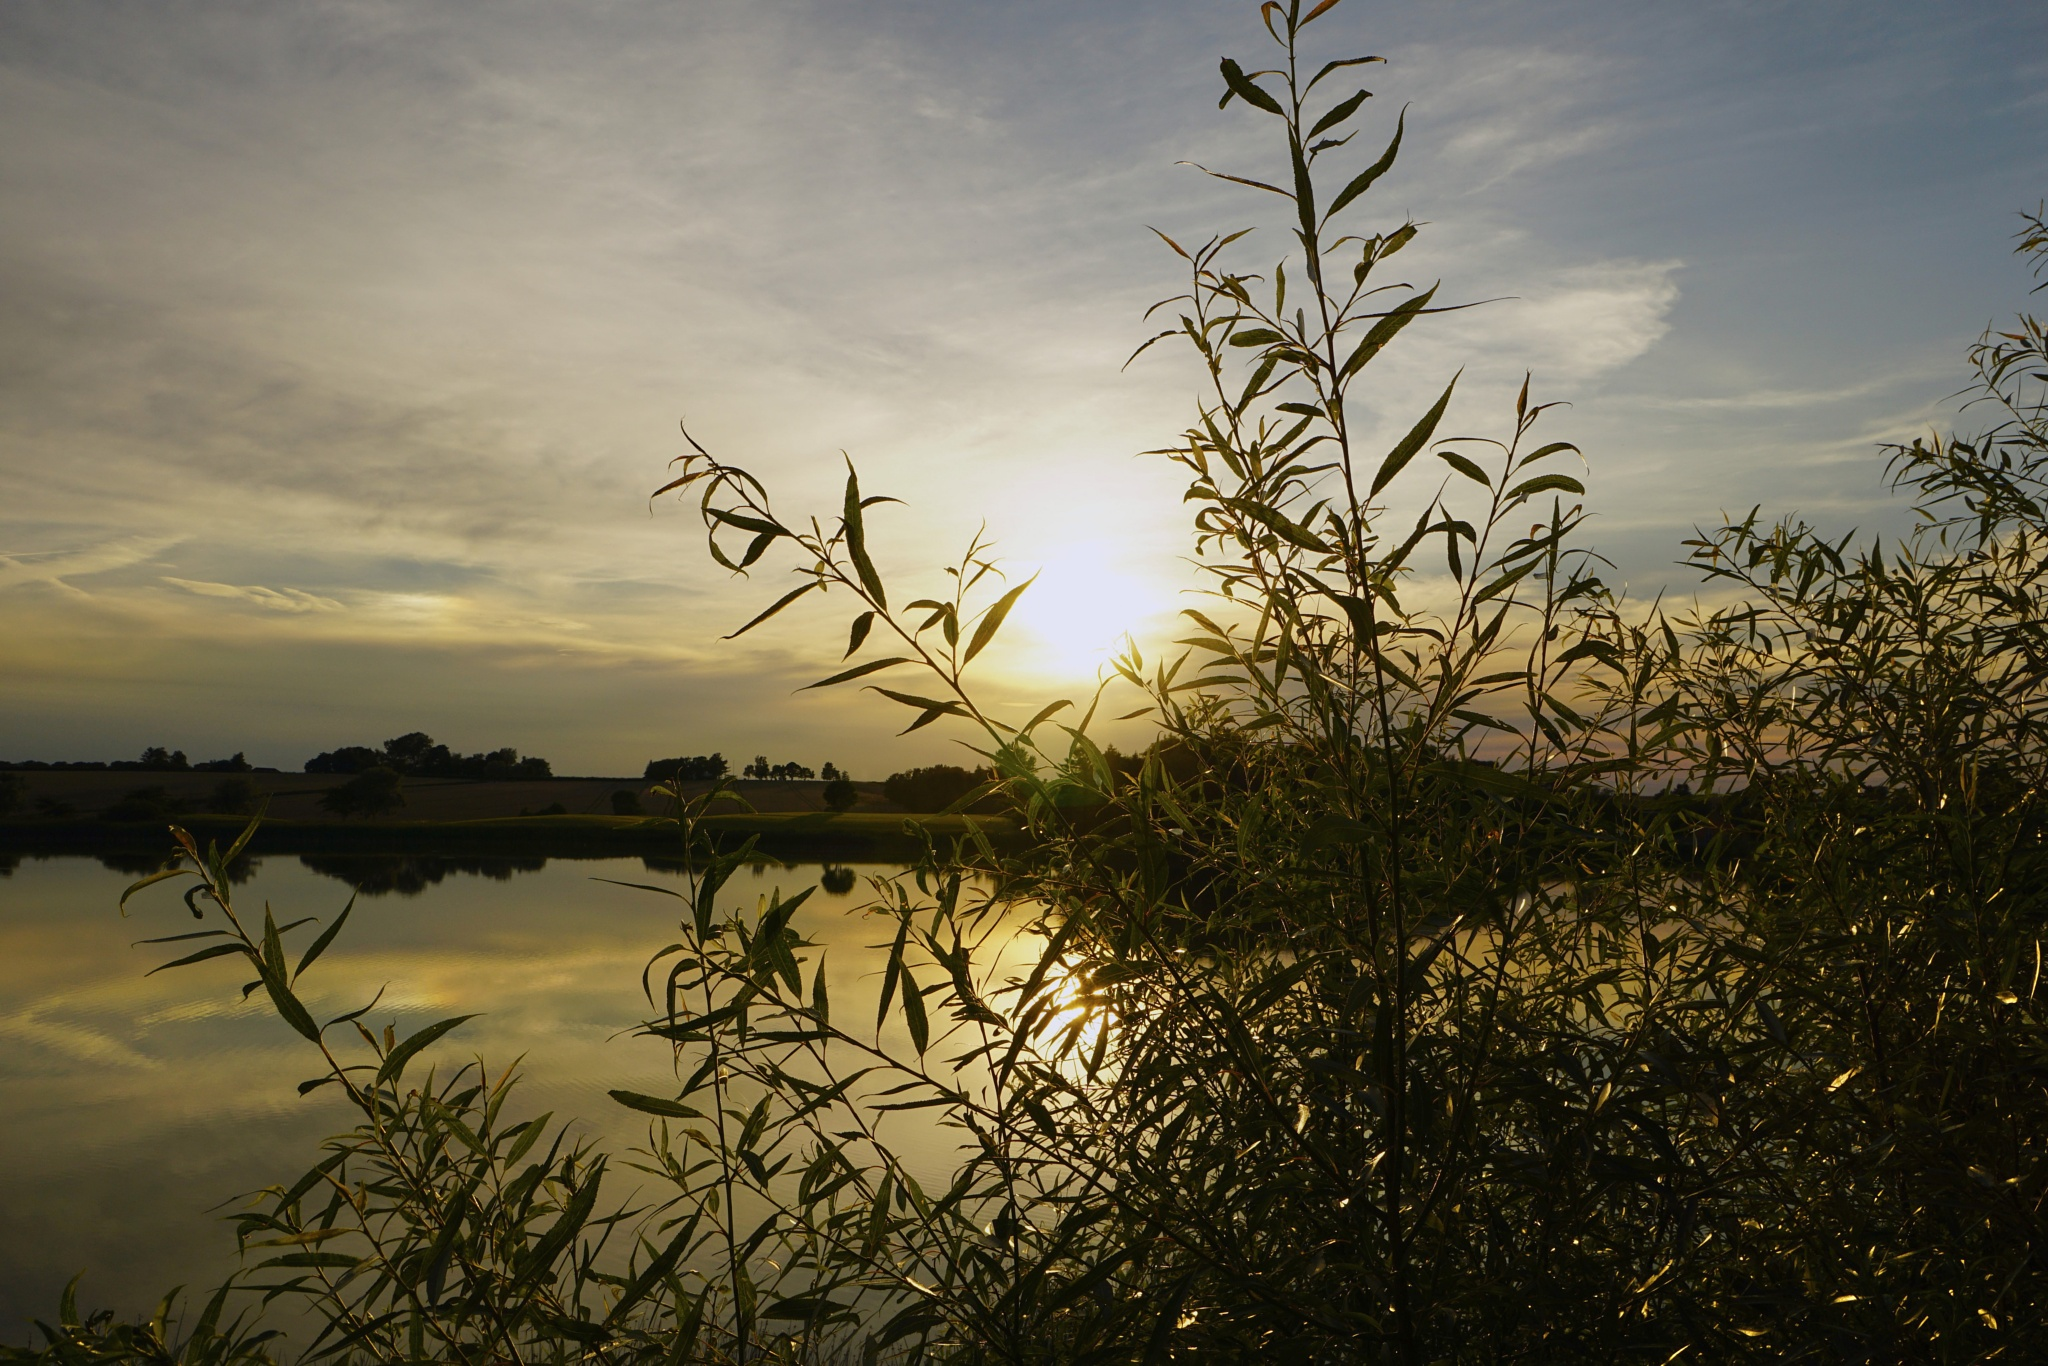 Before sunset by Dorte Hedengran